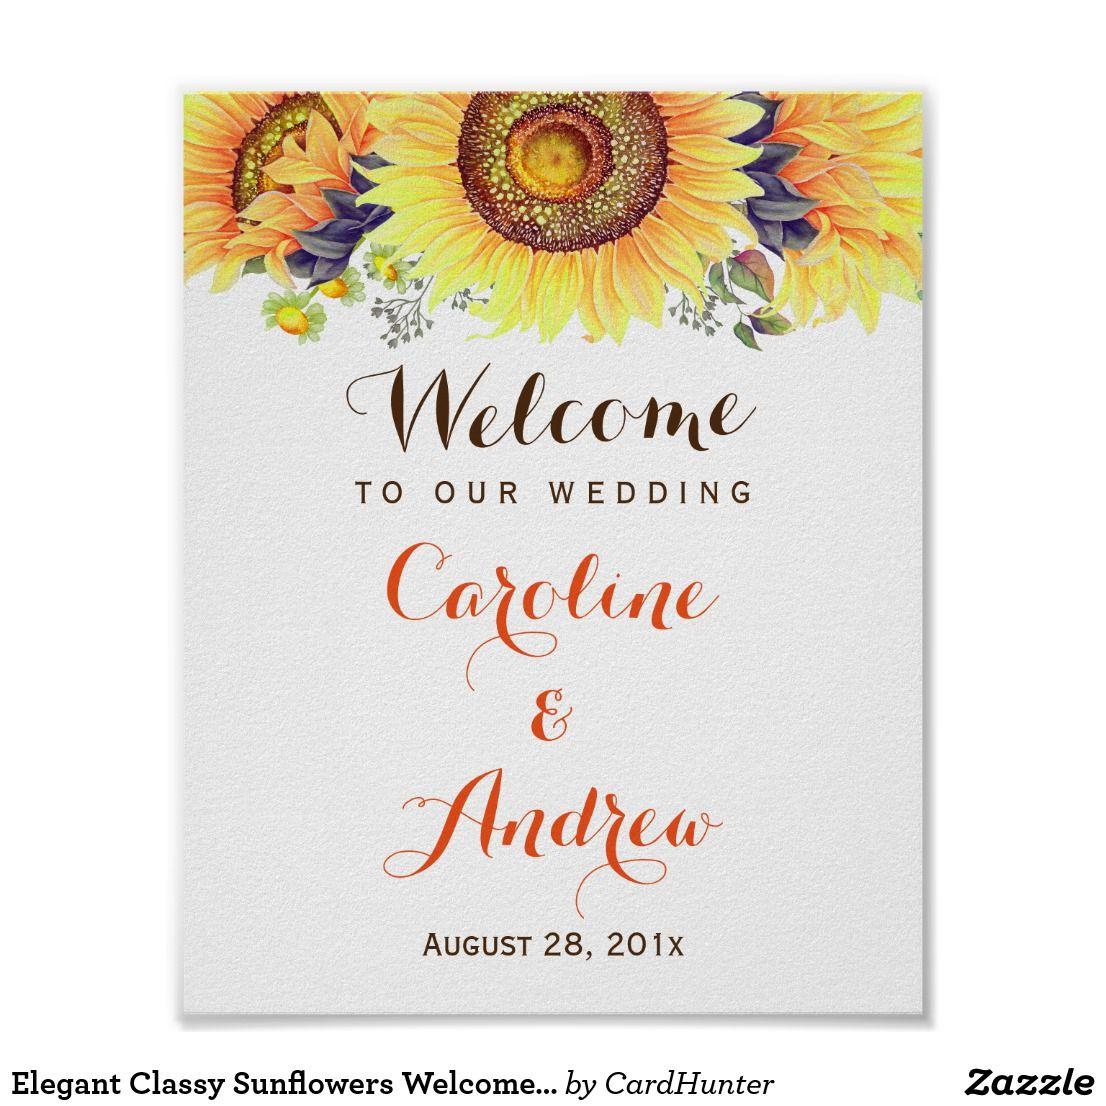 Elegant Classy Sunflowers Welcome Wedding Sign | Sunflowers ...